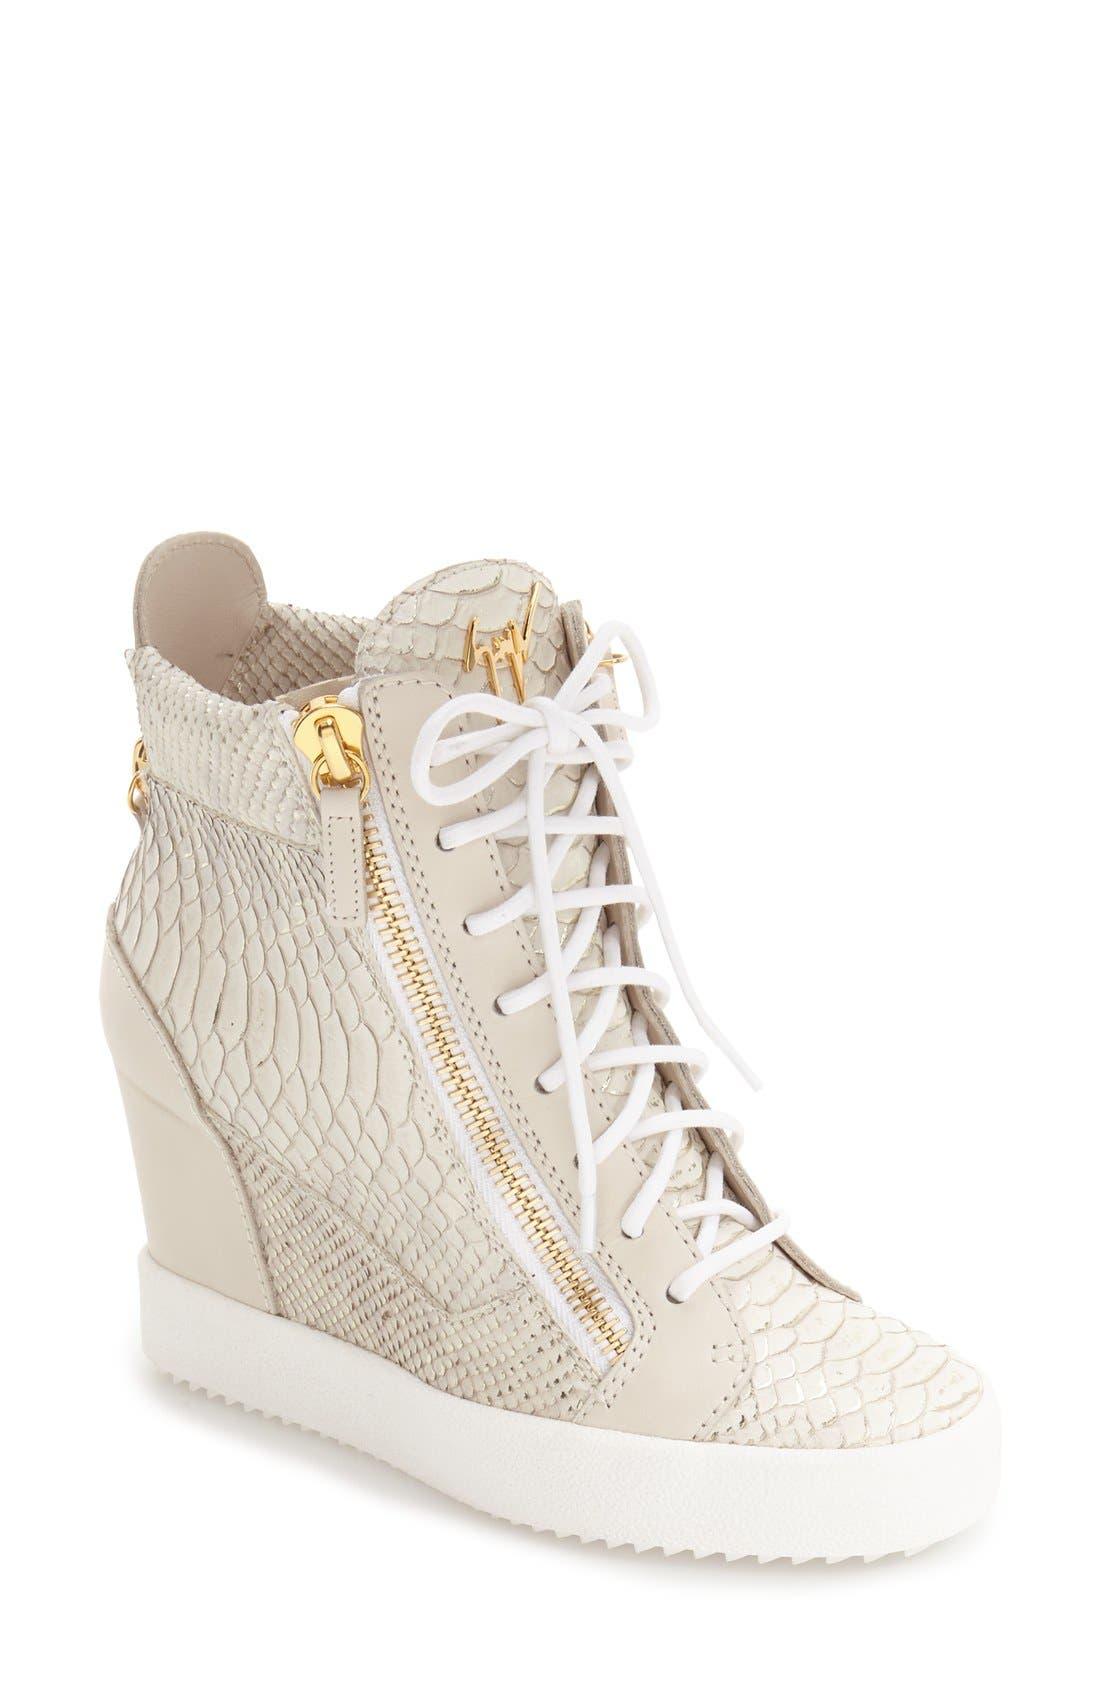 GIUSEPPE ZANOTTI,                             Ofelia Wedge Sneaker,                             Main thumbnail 1, color,                             040